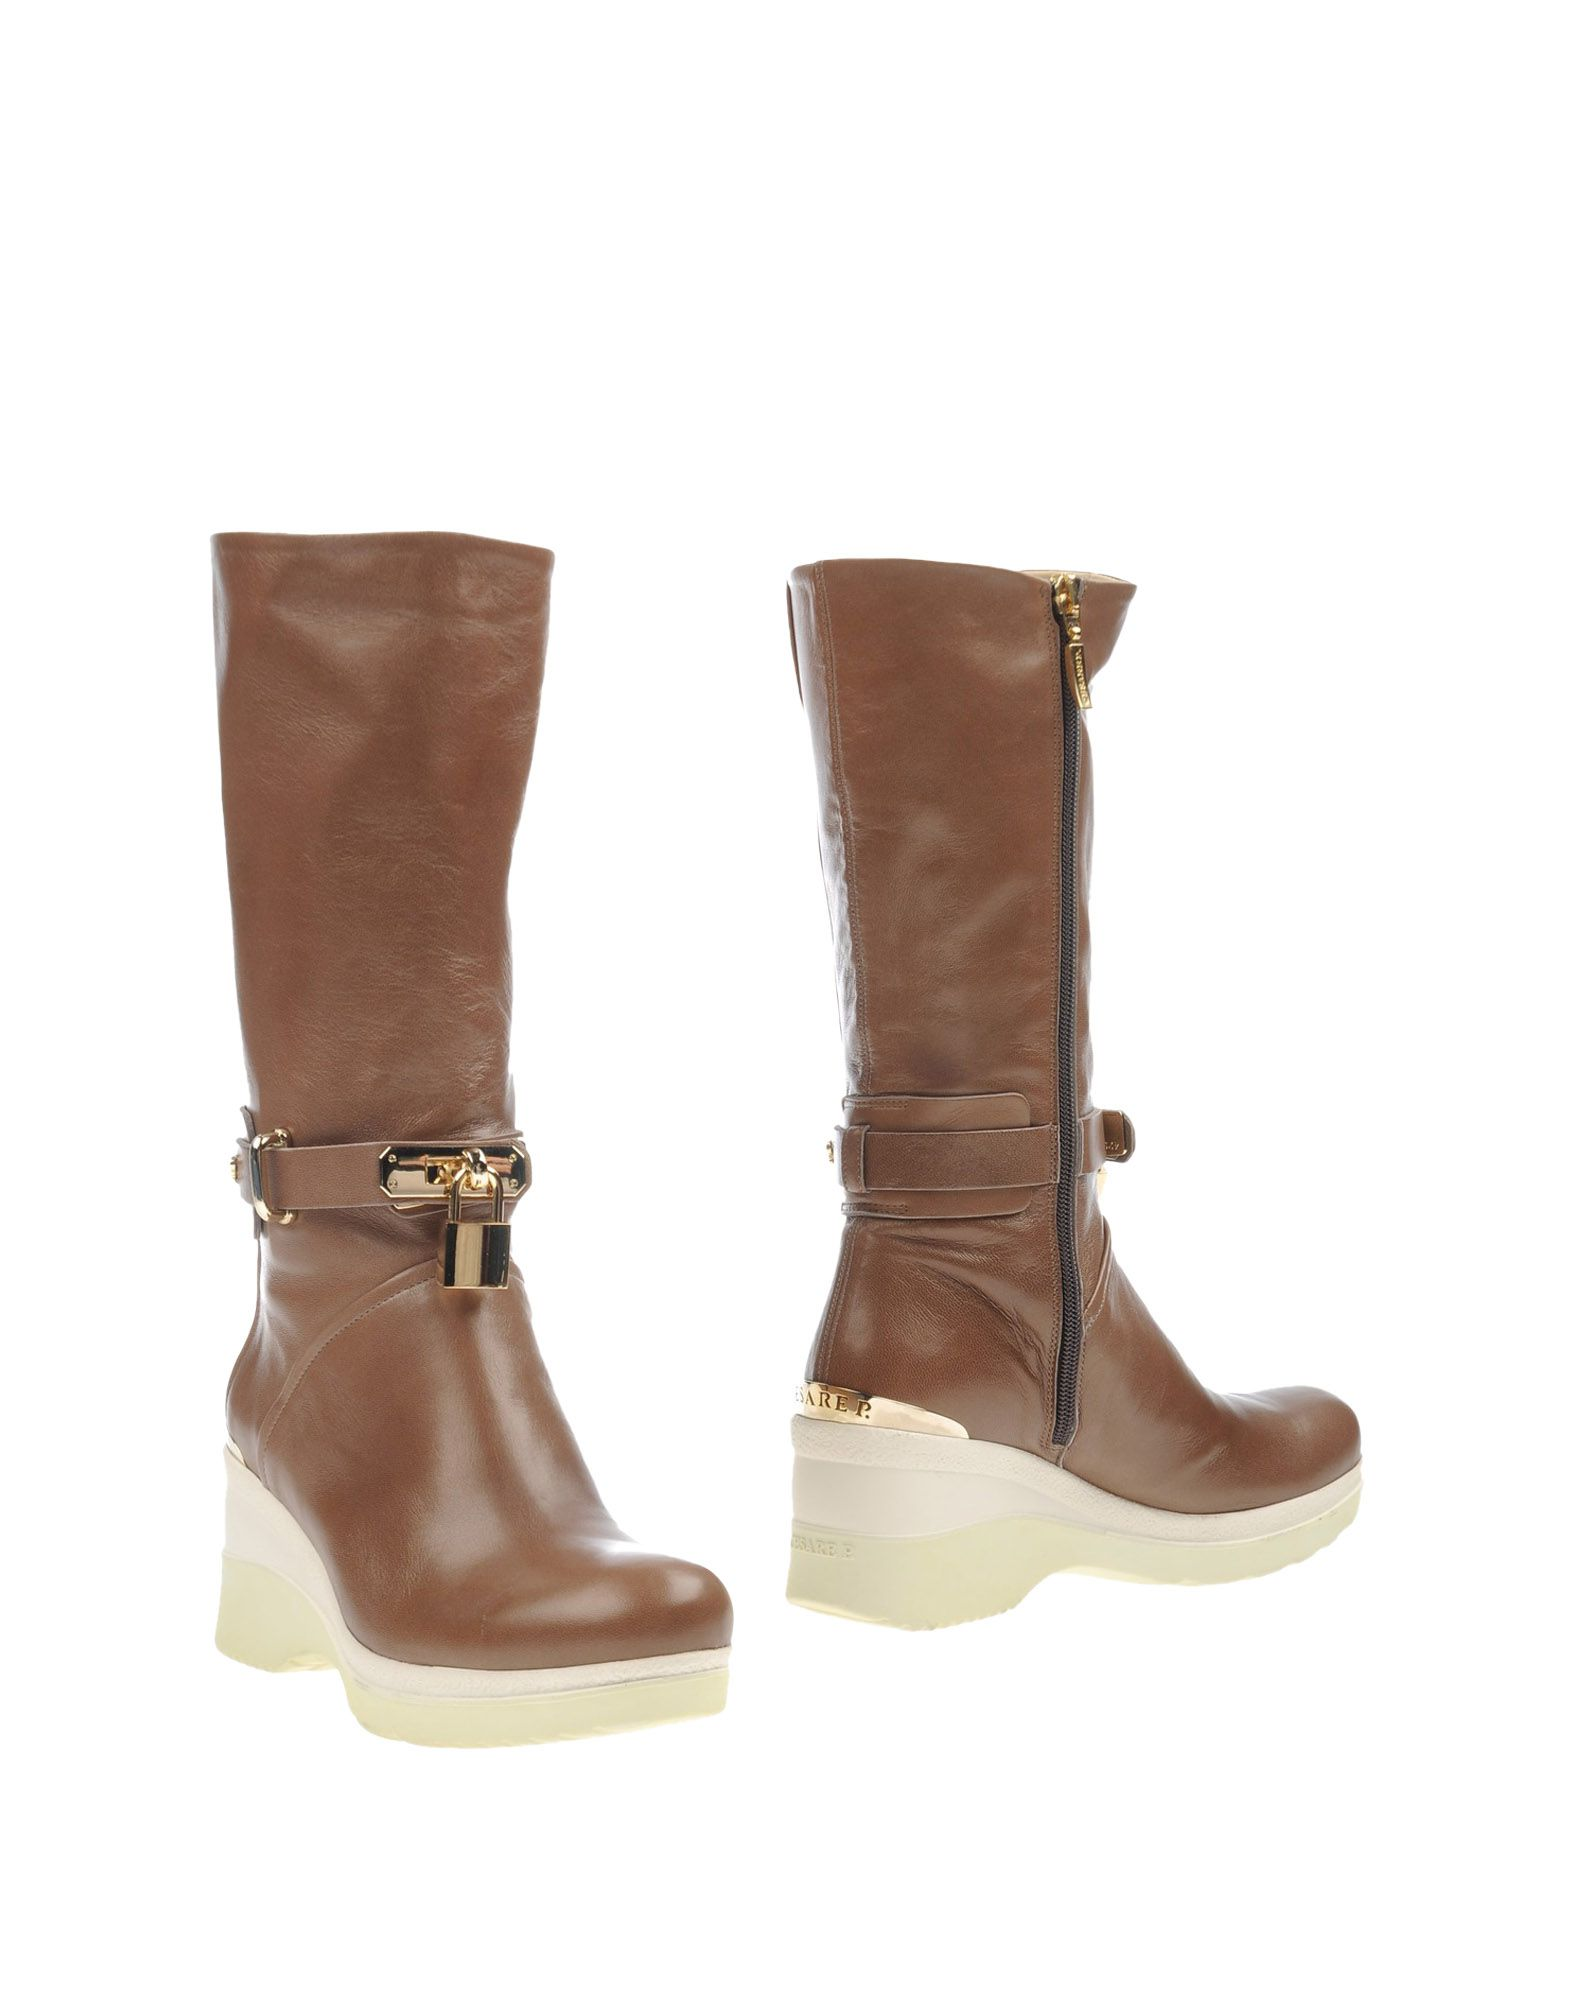 Cesare P. Boots Boots - Women Cesare P. Boots Boots online on  United Kingdom - 44871232BS 8b8942